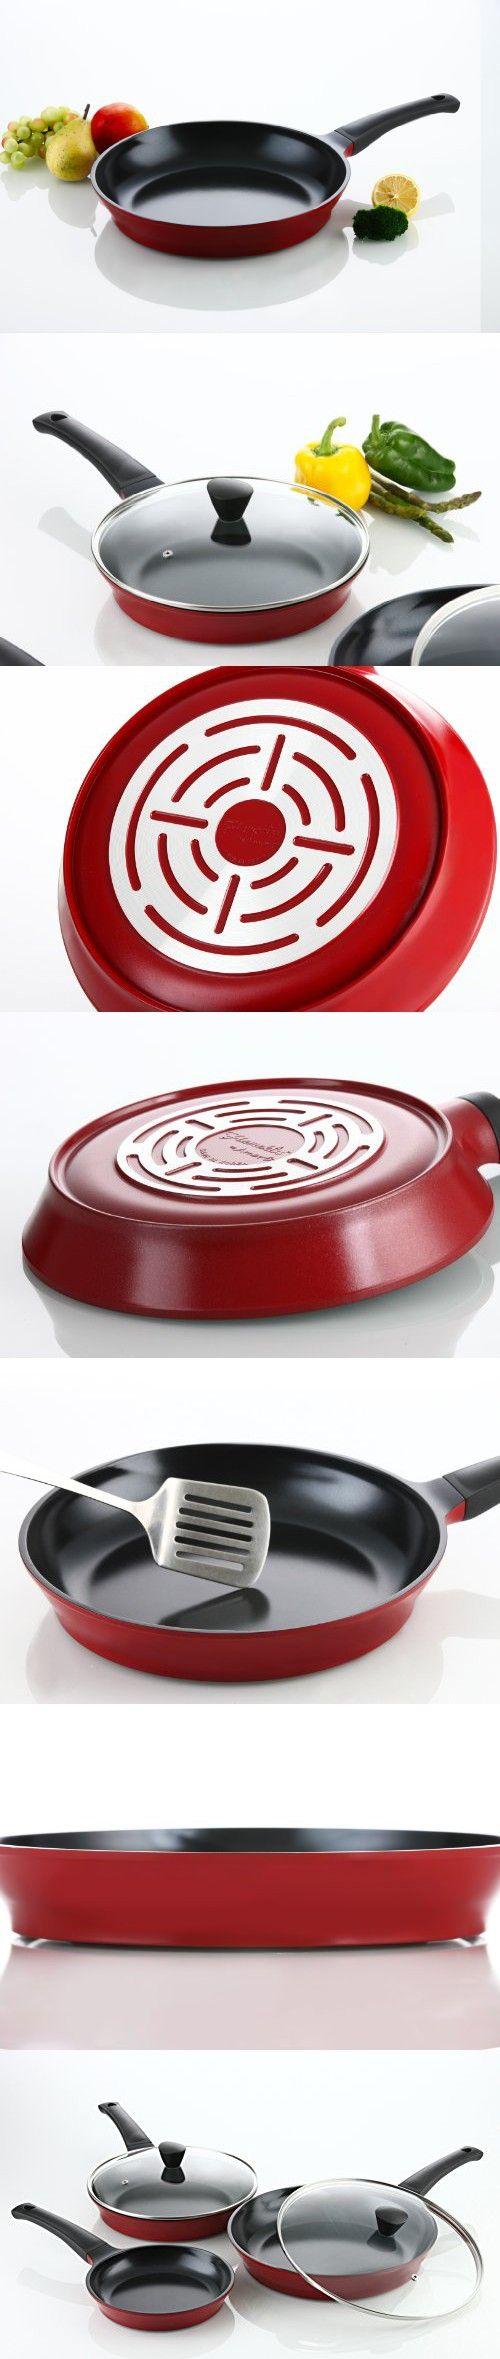 Flamekiss 5-piece Cookware Set, 3 Ceramic Coated Nonstick Fry Pans w/ 2 Glass Lids by Amorè, Innovative Design & Elegant Looks, Nano Ceramic Coating w/ Silver Ion (100% PTFE & PFOA Free)